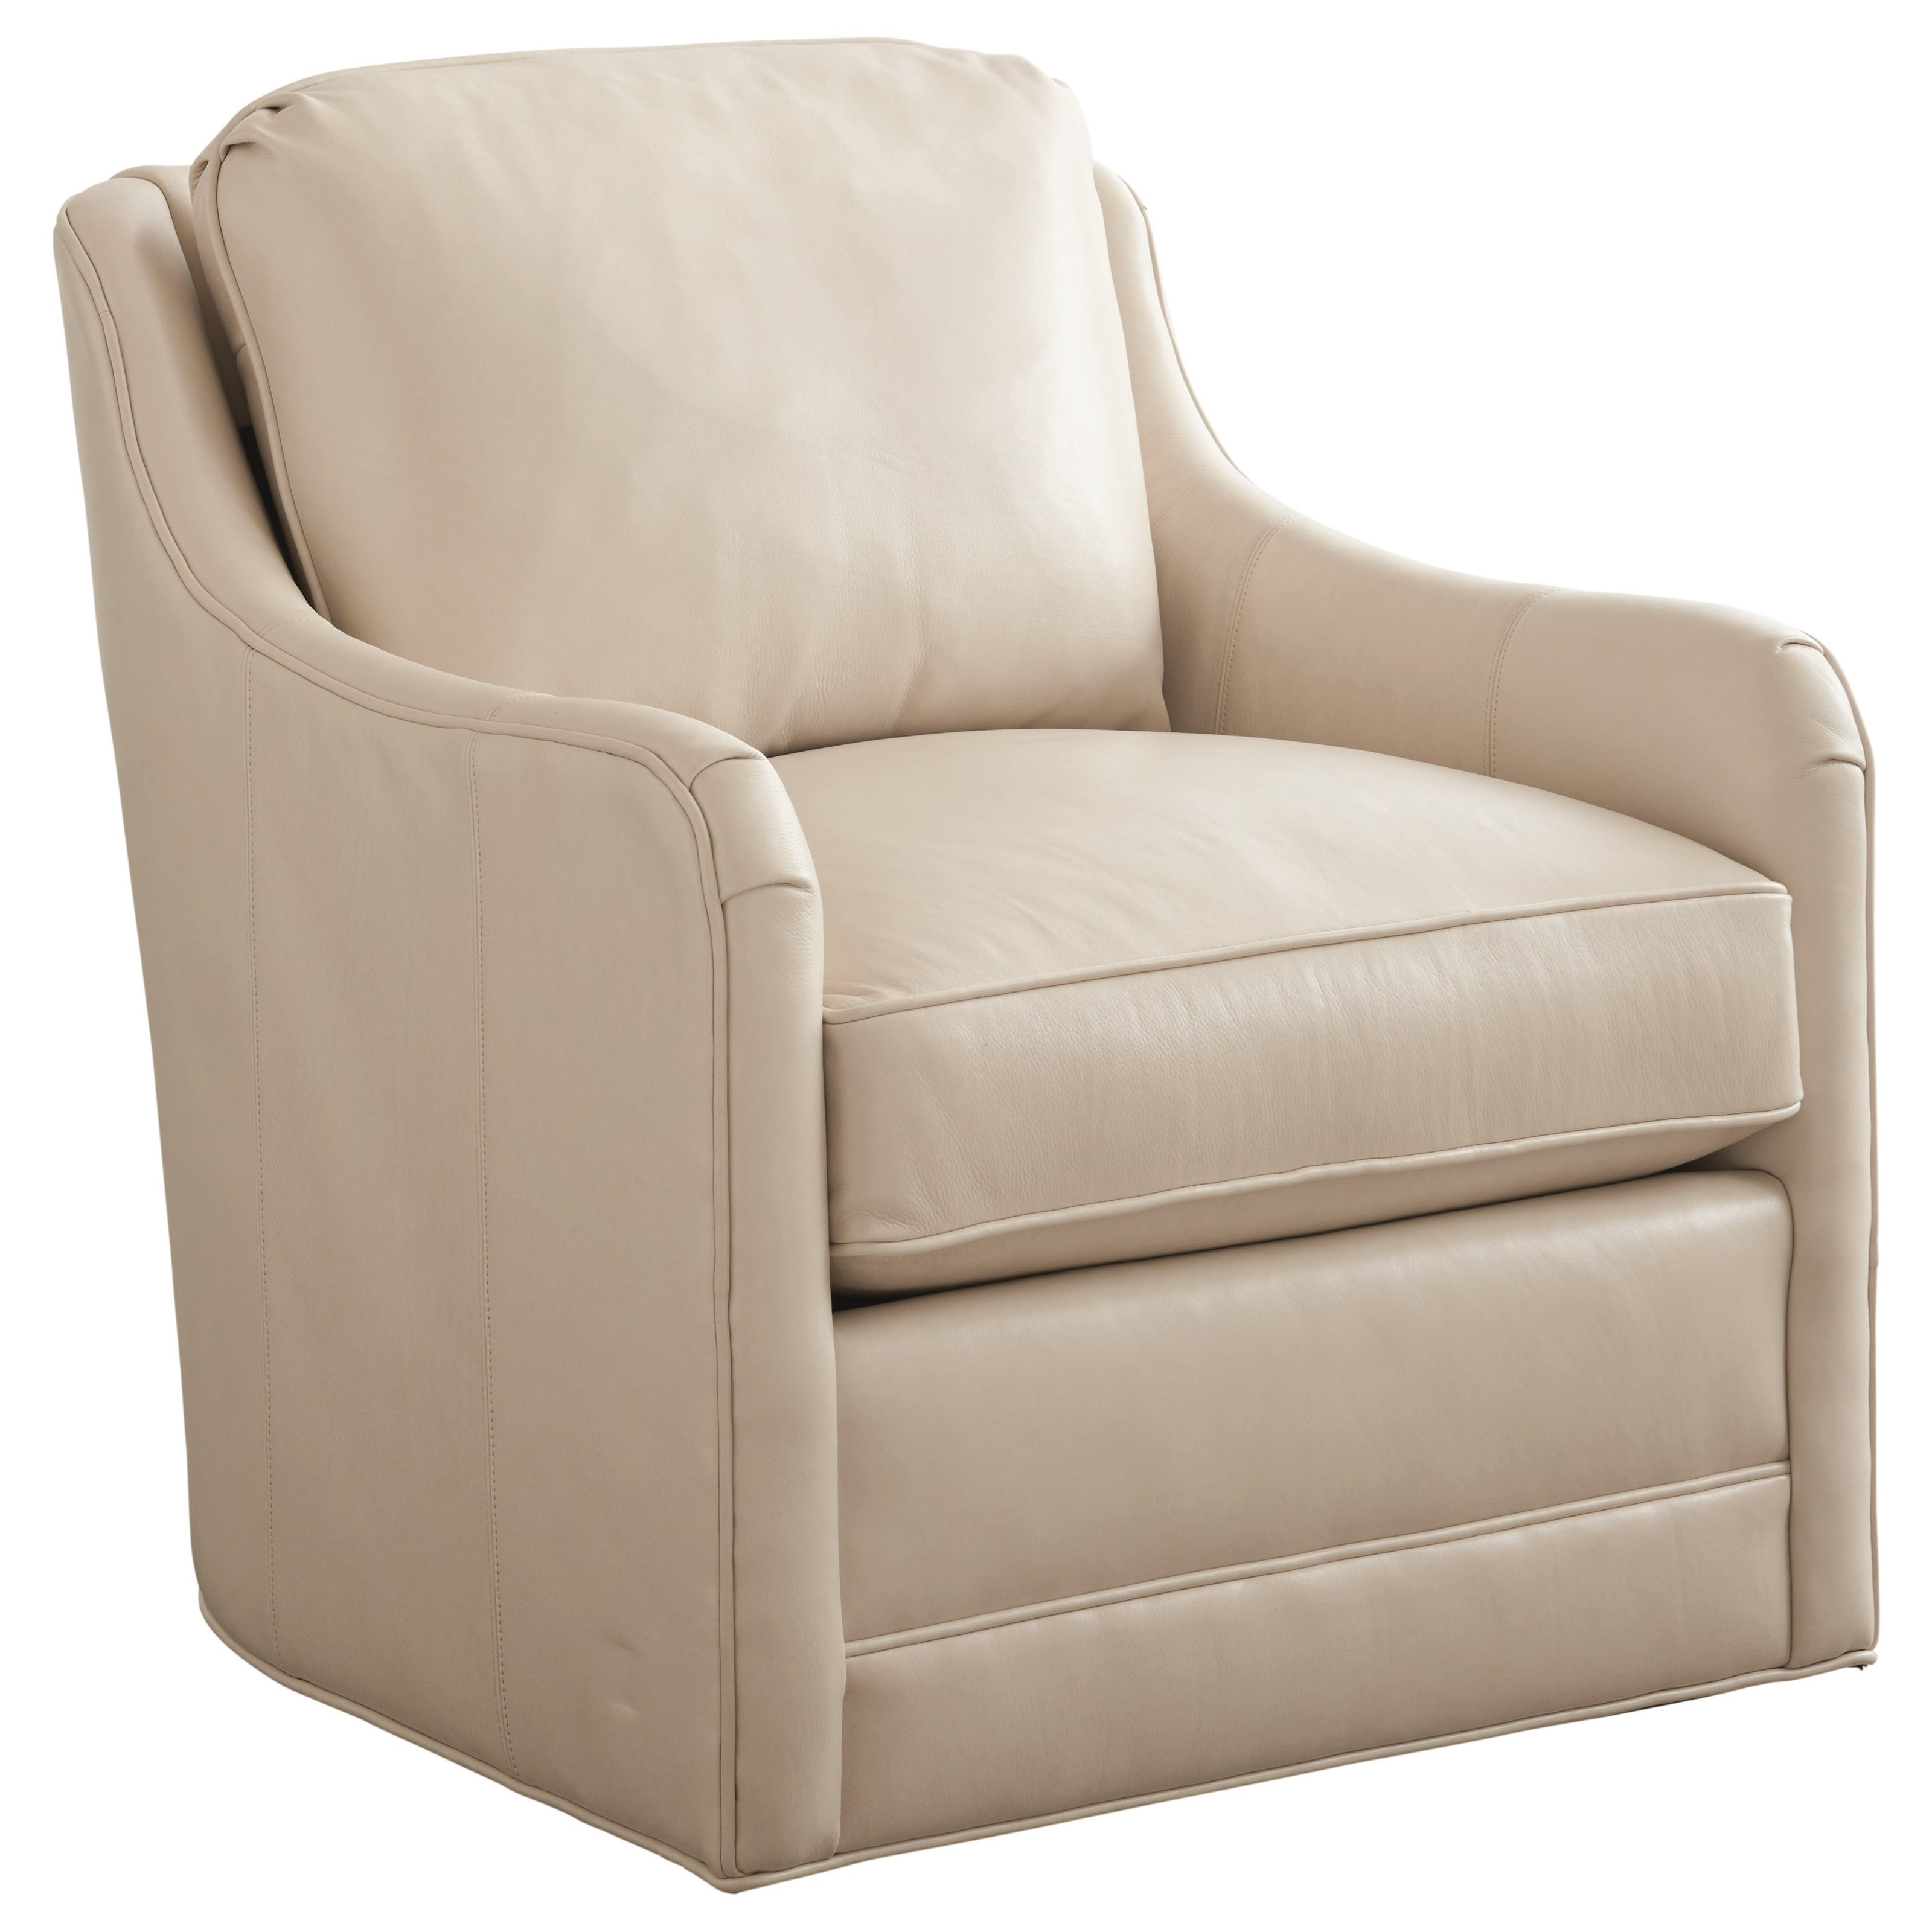 Barclay Butera Upholstery Glenhaven Swivel Chair by Barclay Butera at Baer's Furniture